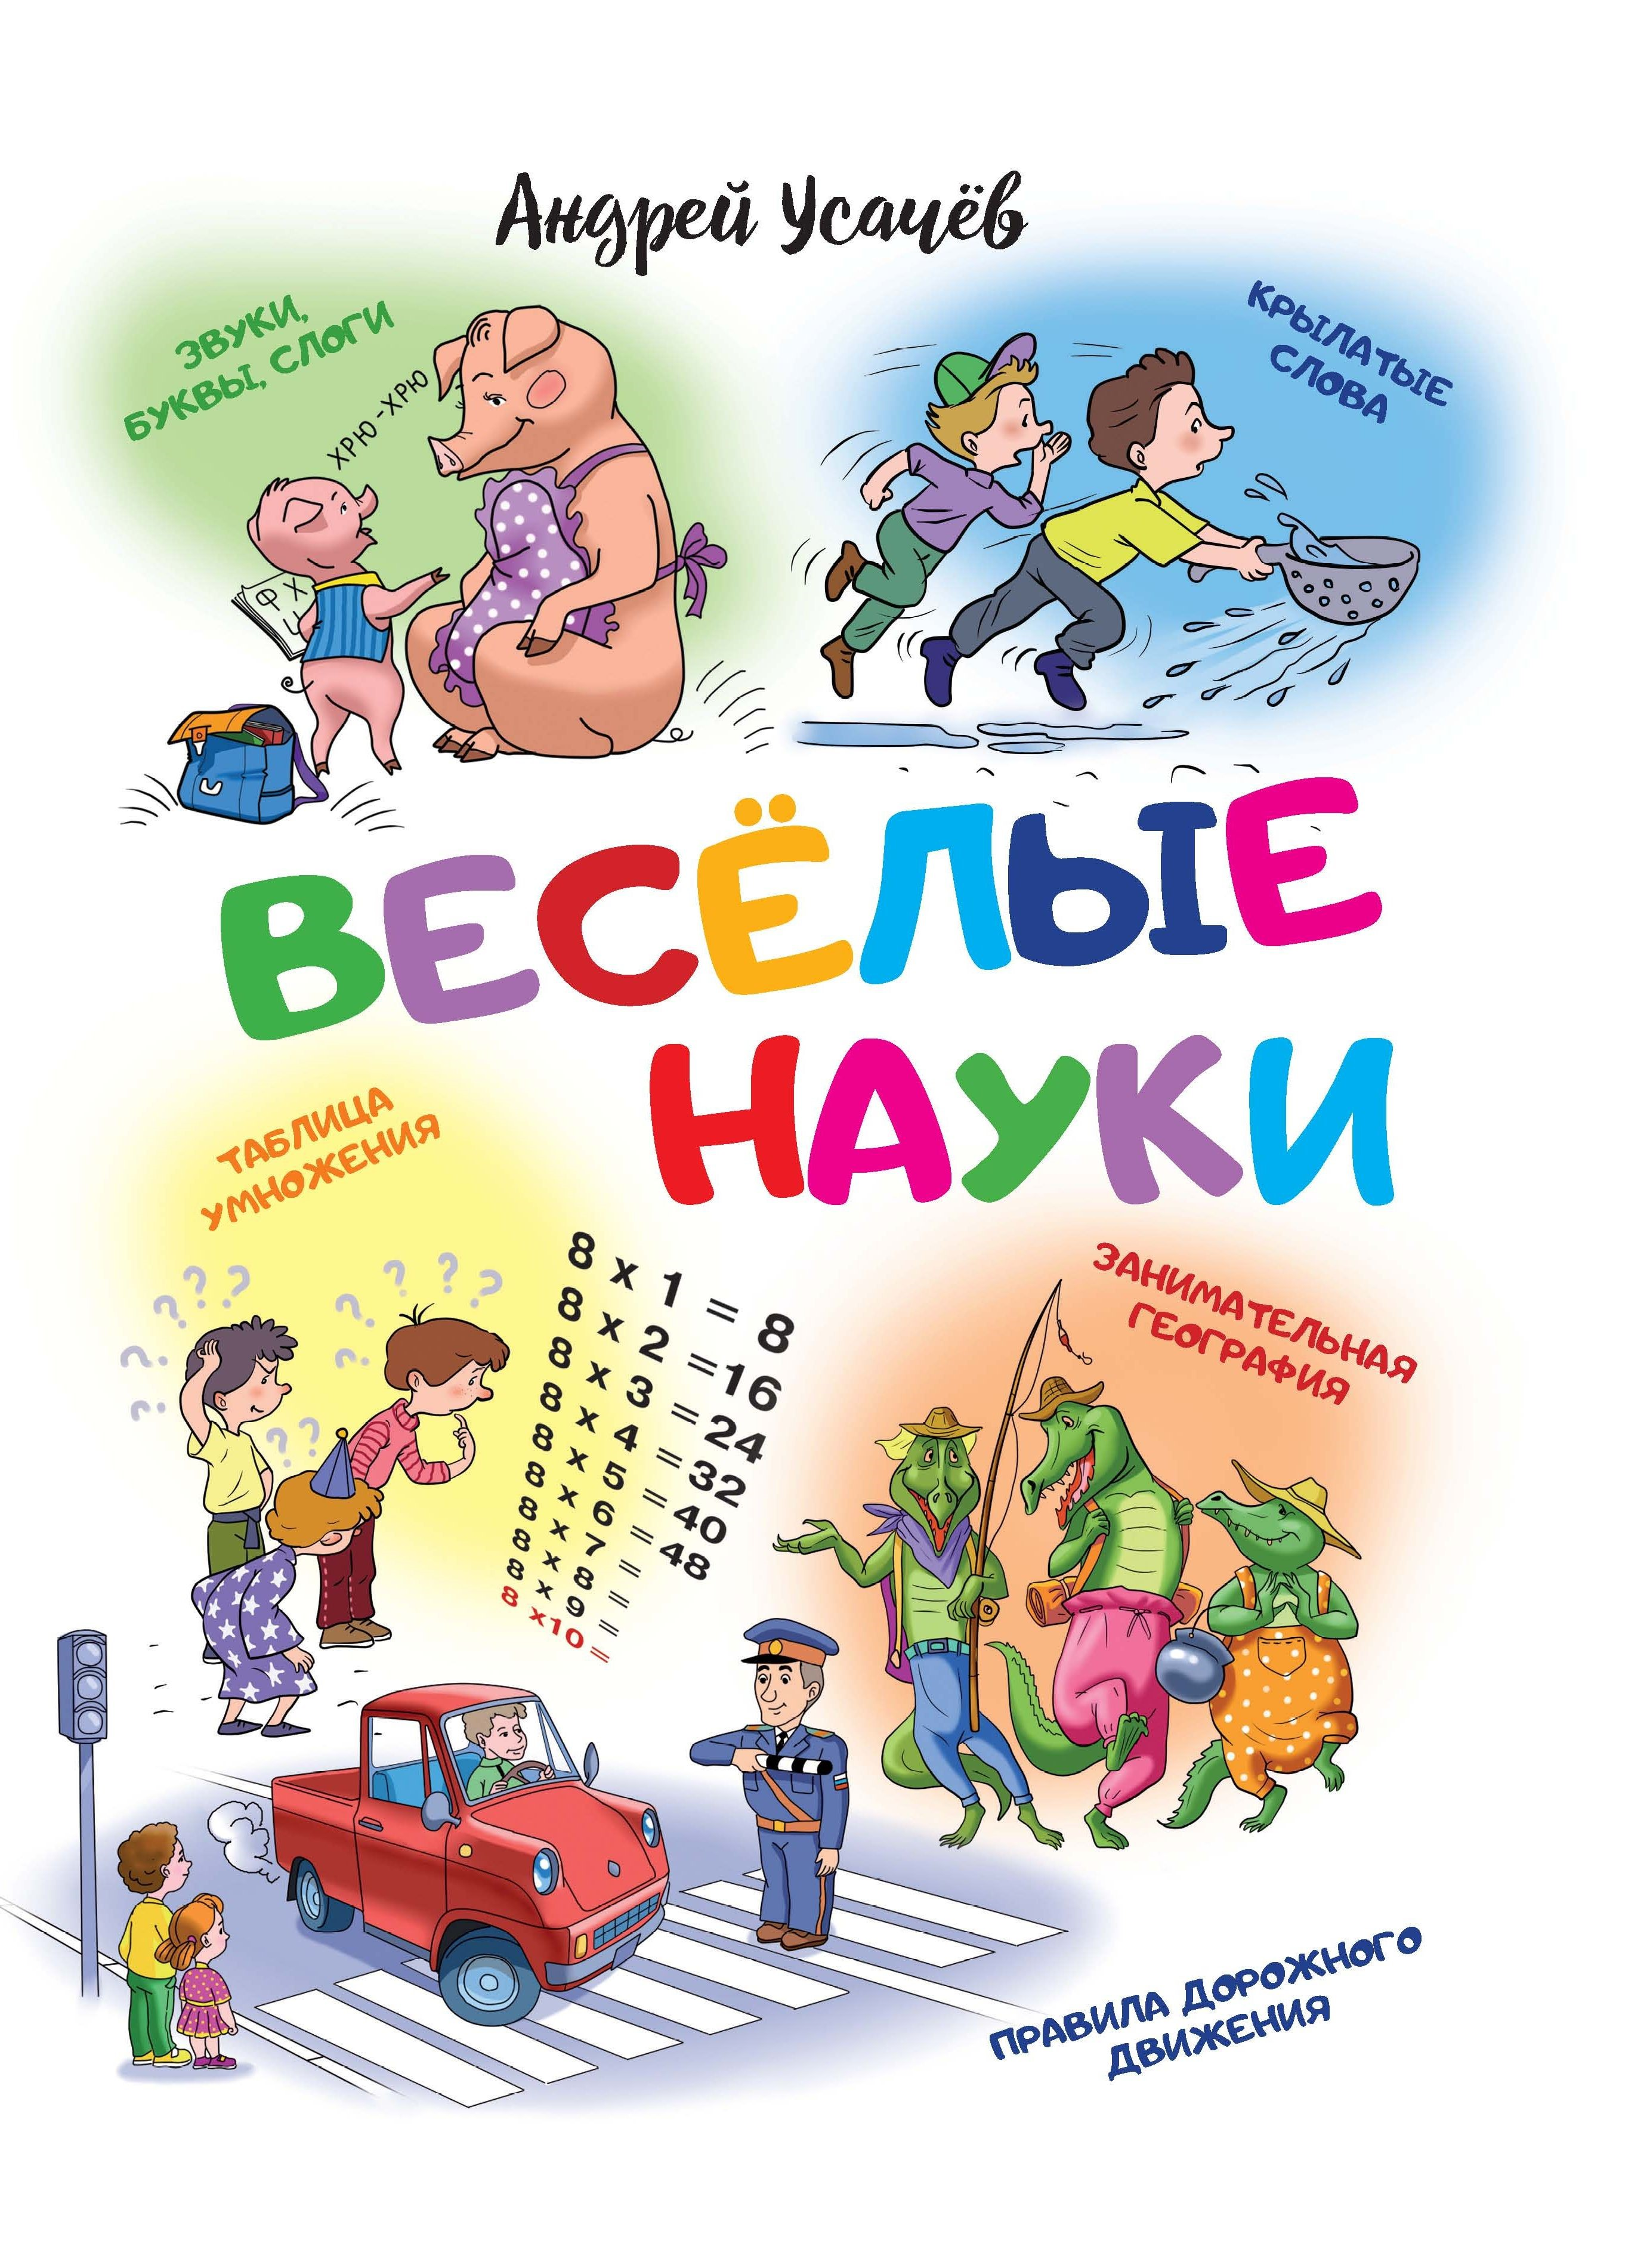 http://onyx.ru/wp-content/uploads/2017/08/веселые-науки.jpg